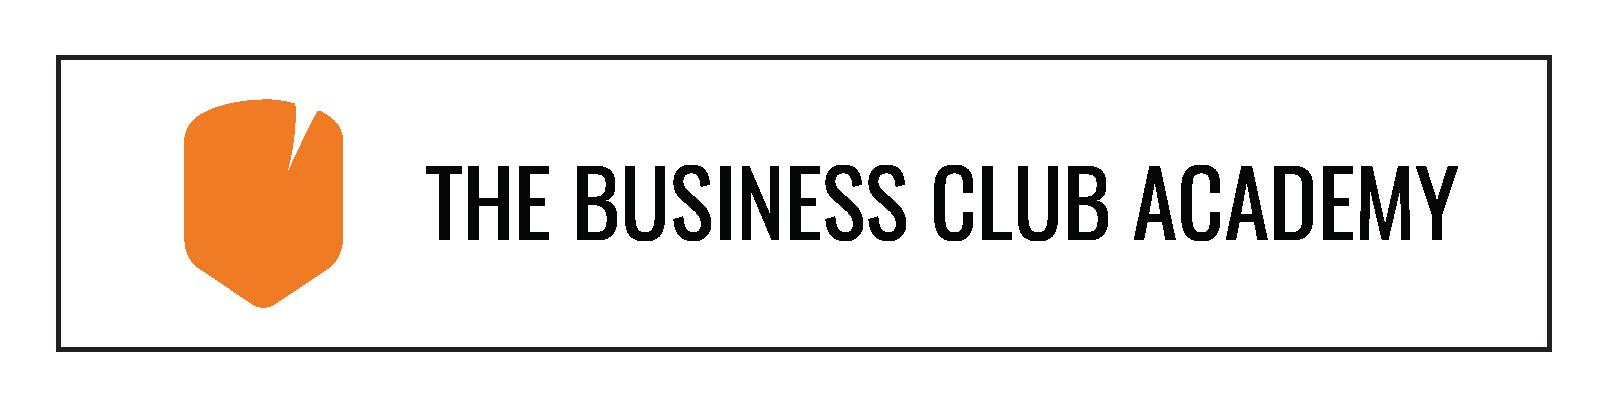 Business Club Accademy